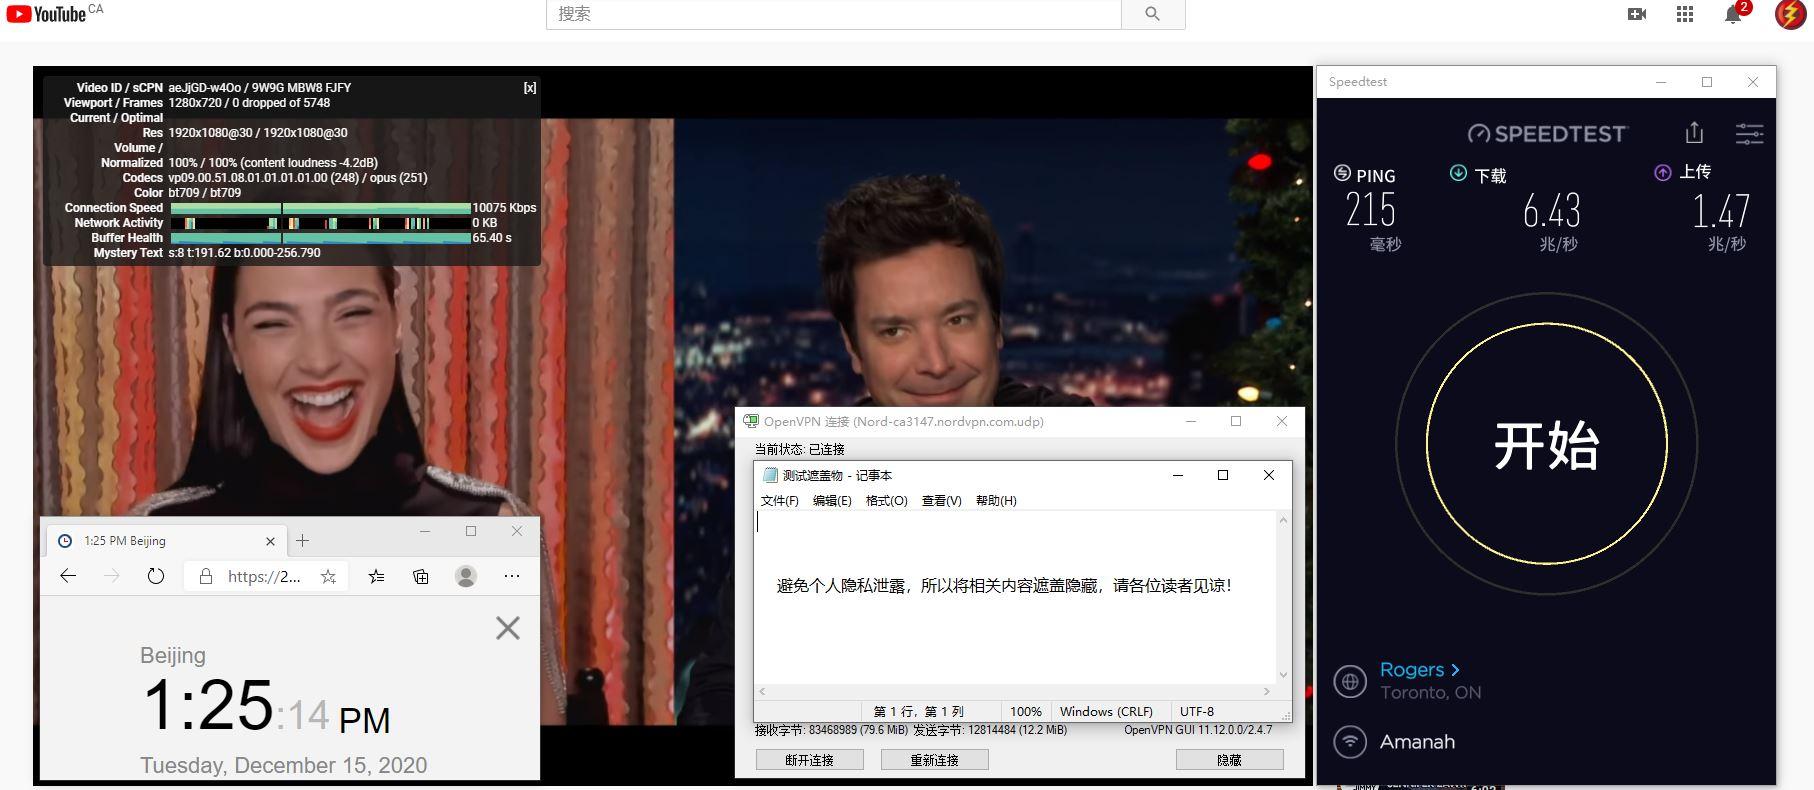 Windows10 NordVPN OpenVPN Gui Ca3147 服务器 中国VPN 翻墙 科学上网 测试 - 20201215